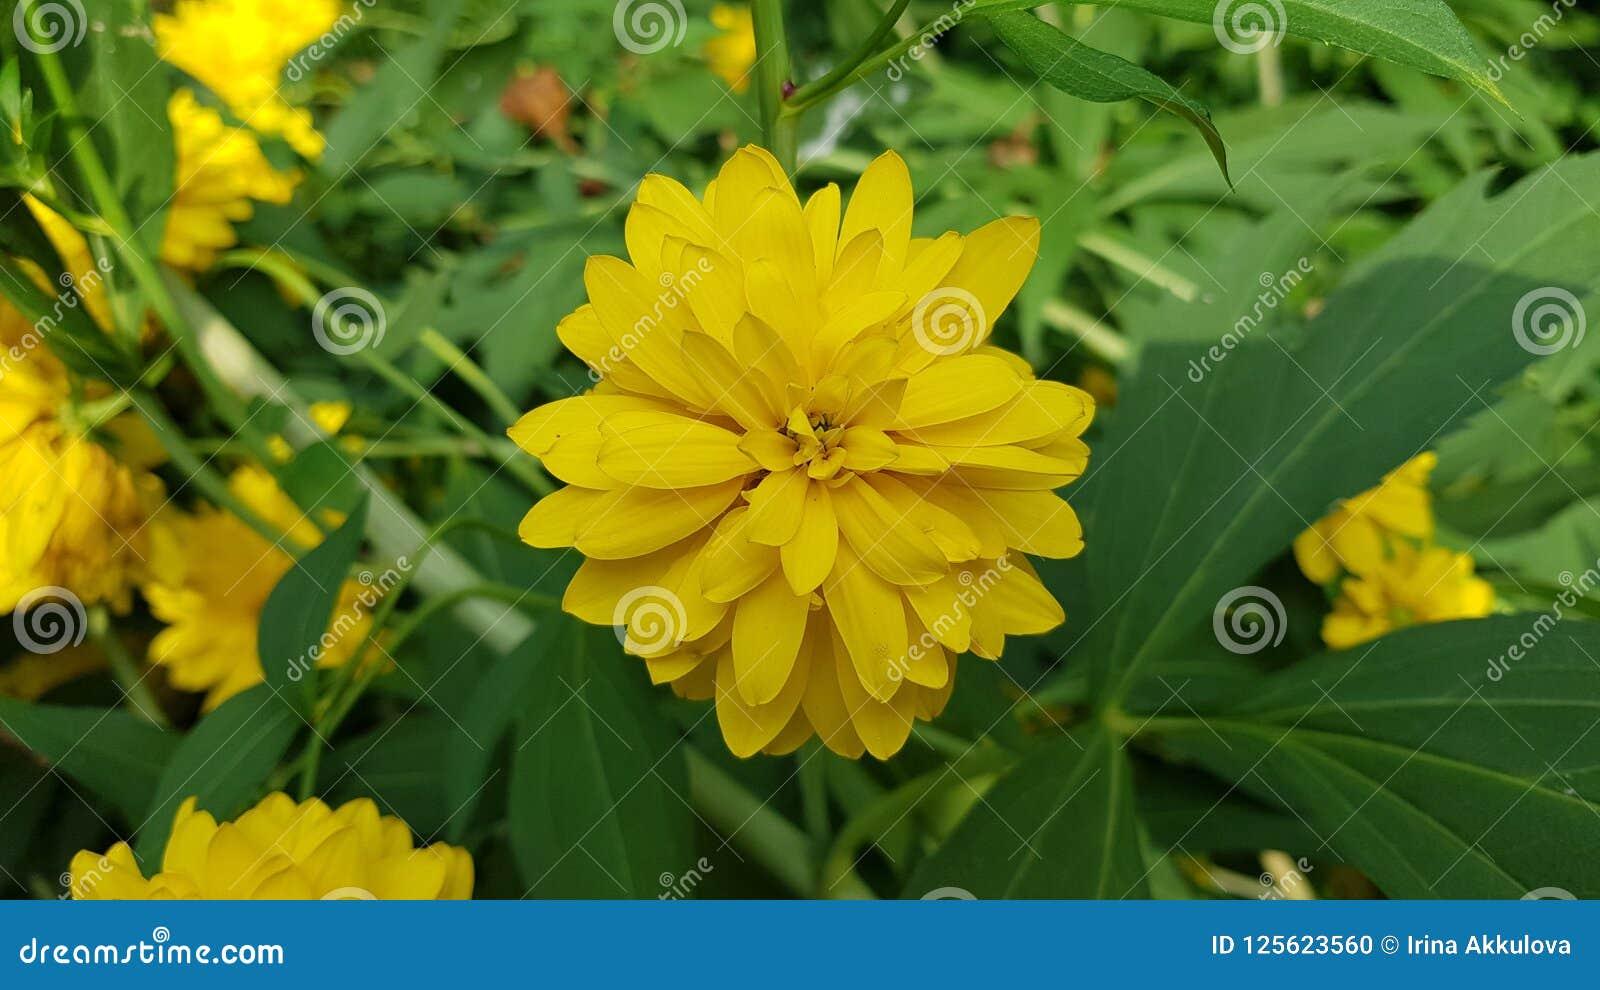 Big yellow flower in garden stock photo image of bouquet pion download big yellow flower in garden stock photo image of bouquet pion 125623560 mightylinksfo